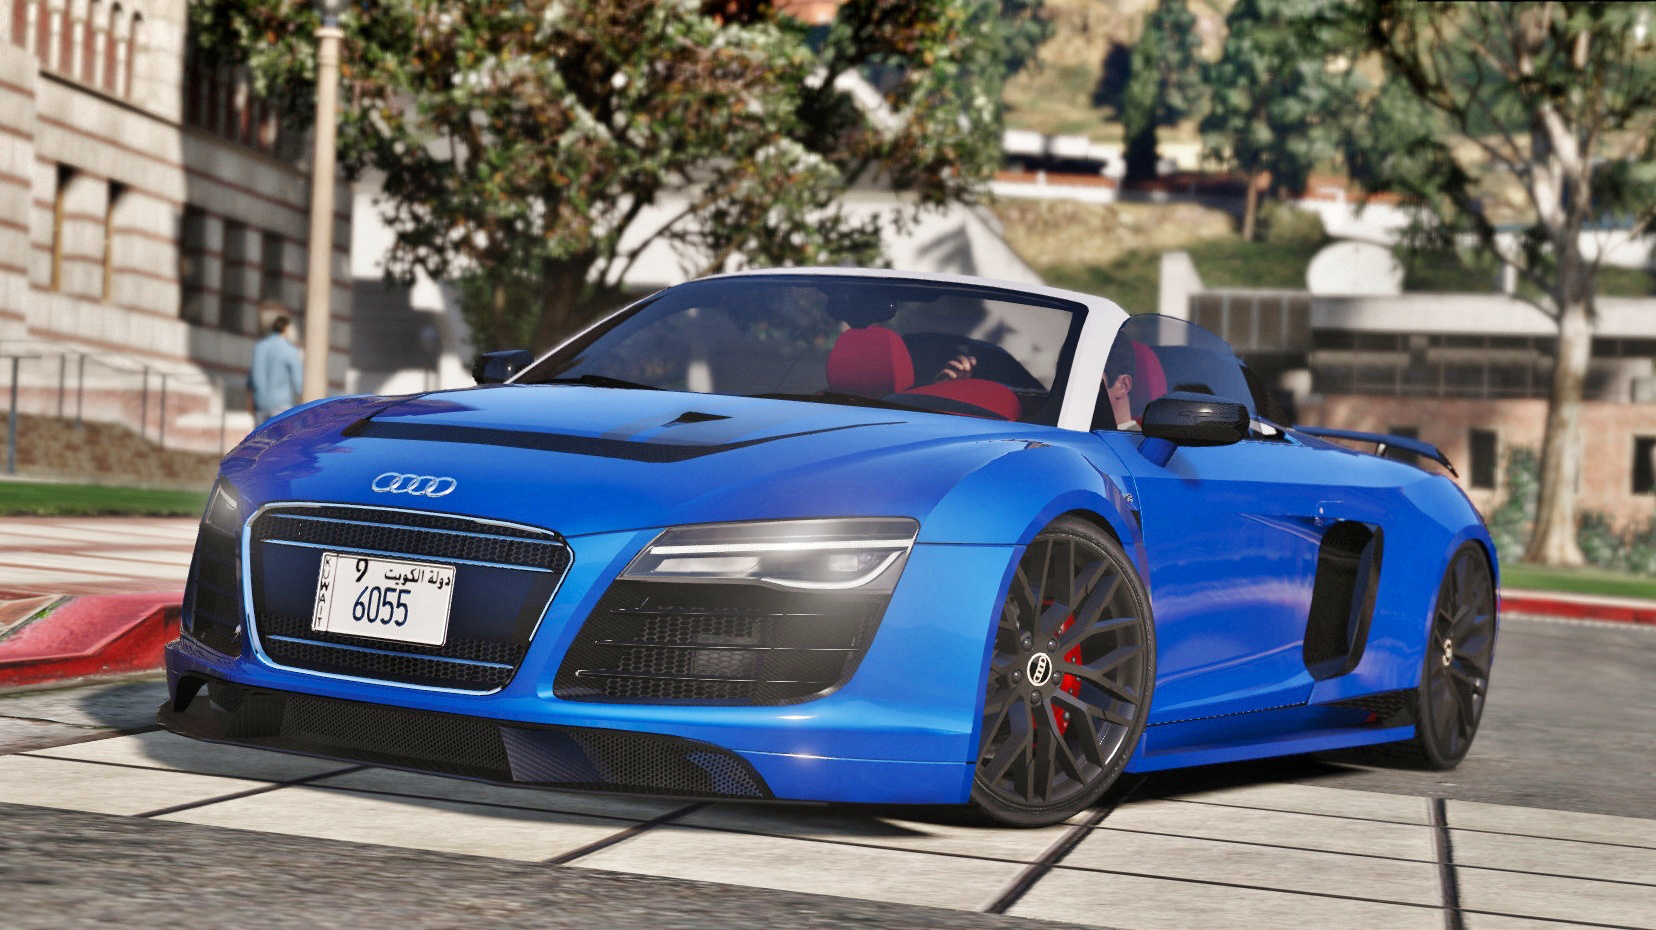 Berühmt 2013 Audi R8 V10 & PPI Razor Tuning [Add-On] - GTA5-Mods.com @YT_71